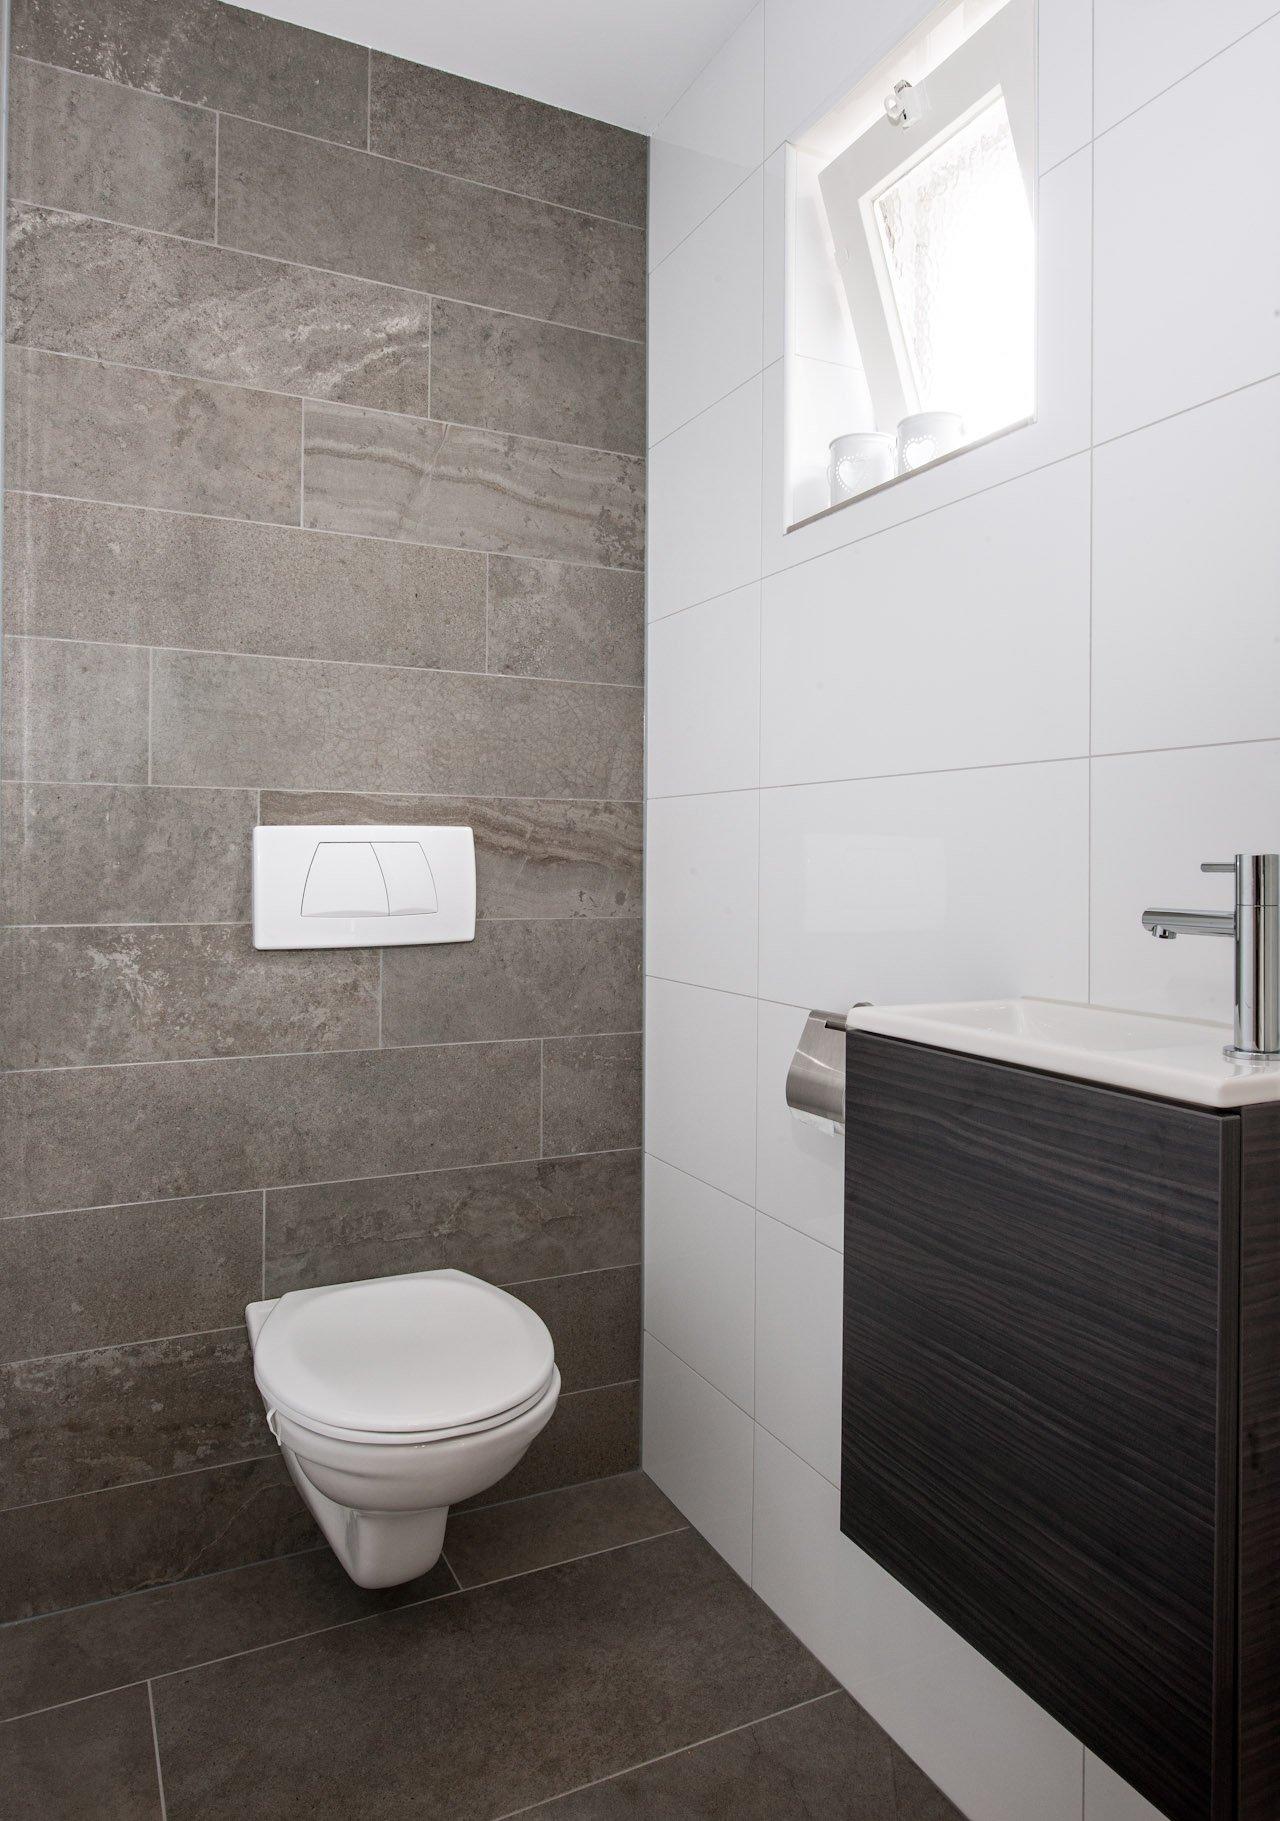 Groot formaat vloertegels in hal en badkamer kroon vloeren in steen - Wc mozaiek ...